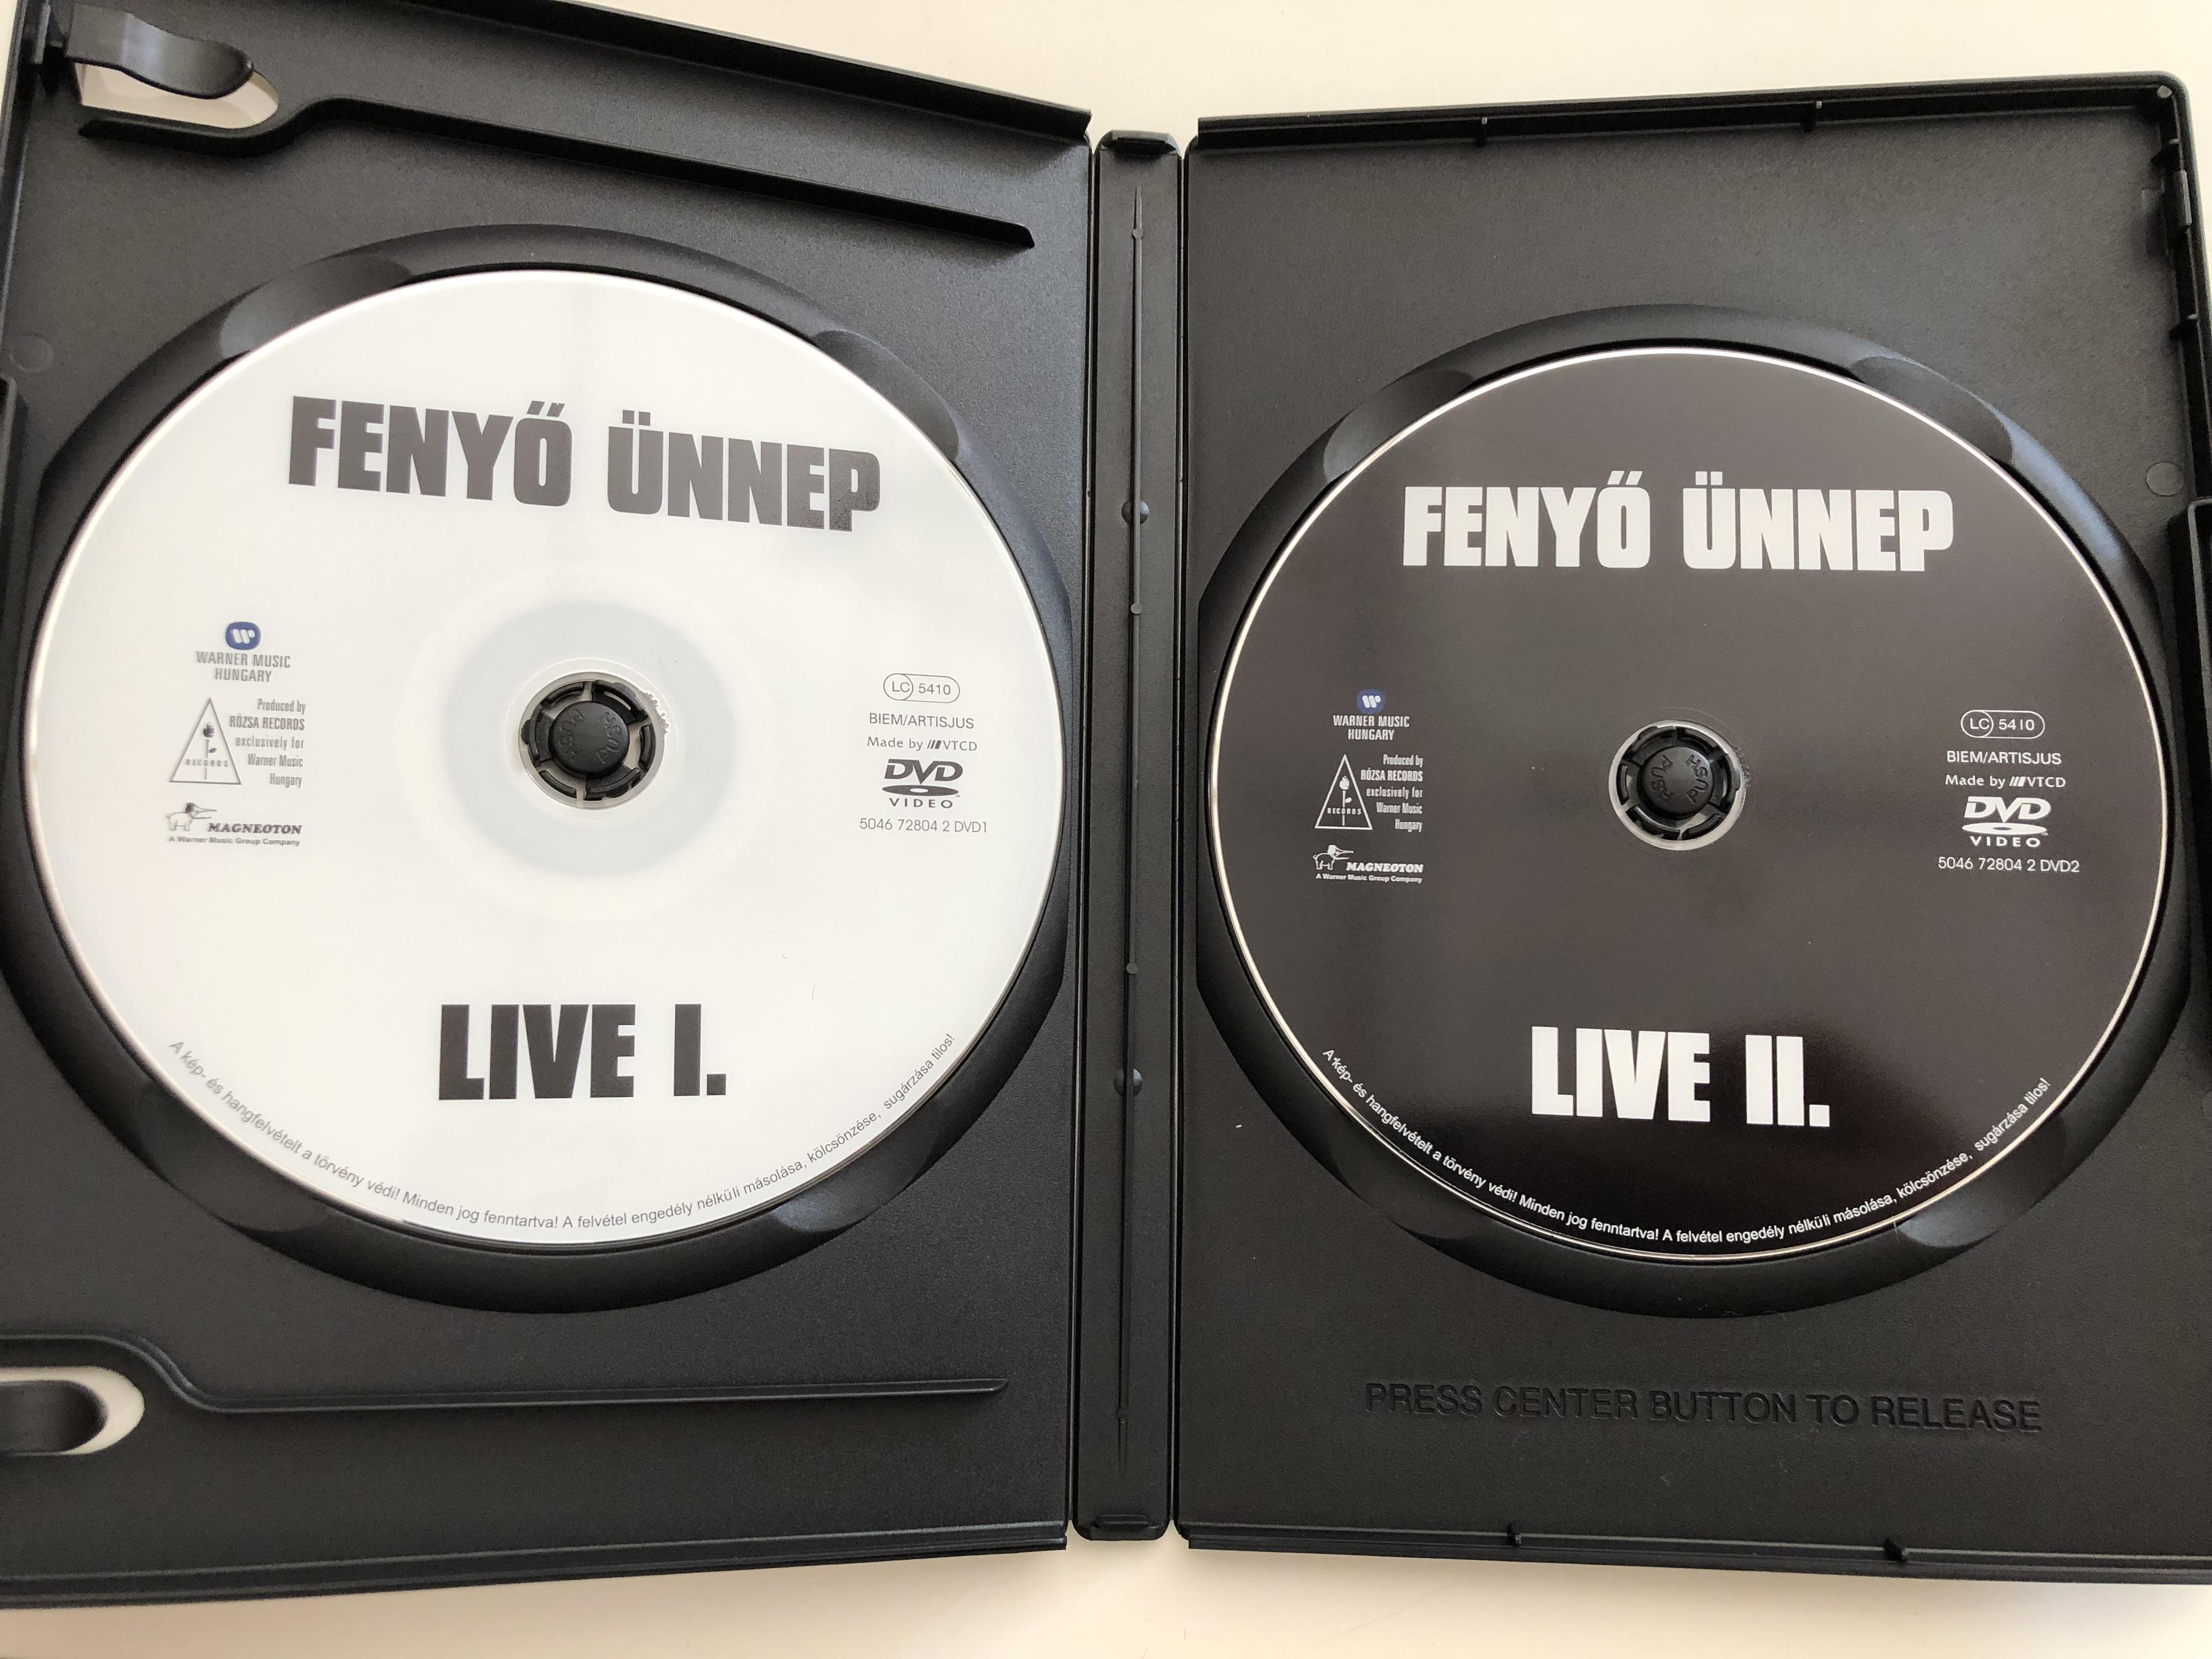 feny-nnep-live-dvd-1996-96.12.27-budapest-sportcsarnok-2-dvd-live-concert-recording-magneoton-produced-by-r-zsa-istv-n-2-.jpg